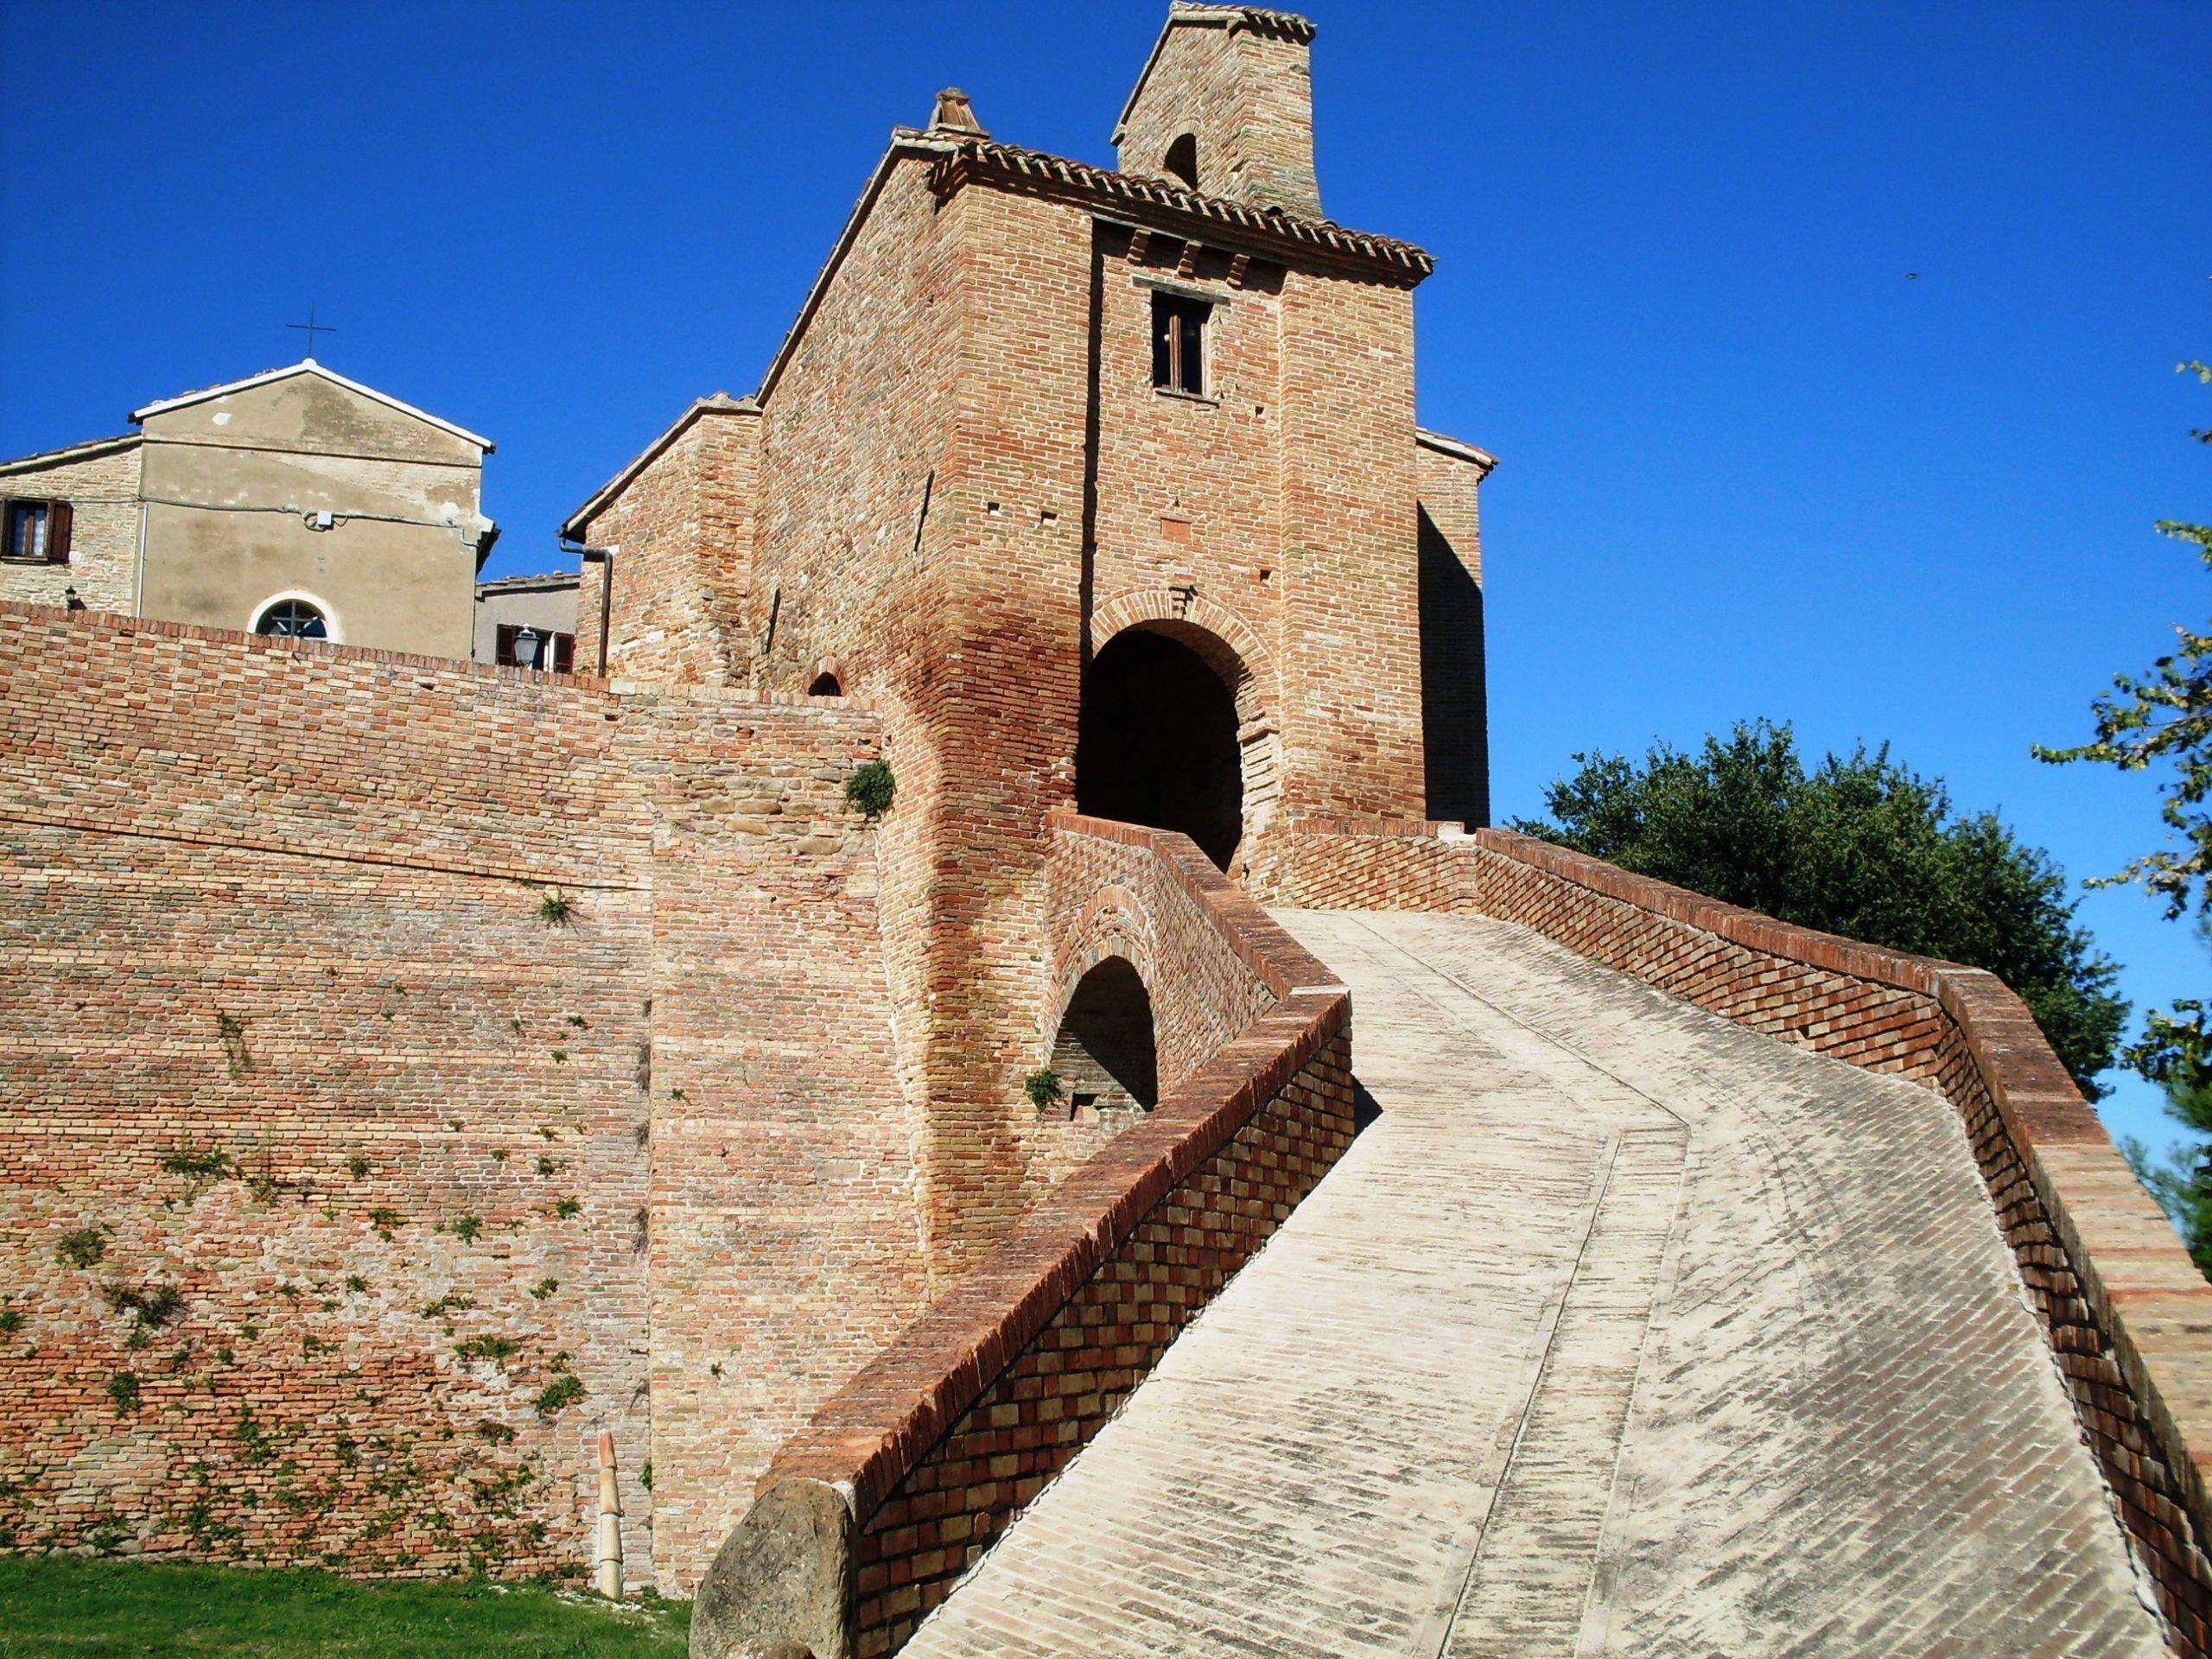 Castello Loretello Arcevia